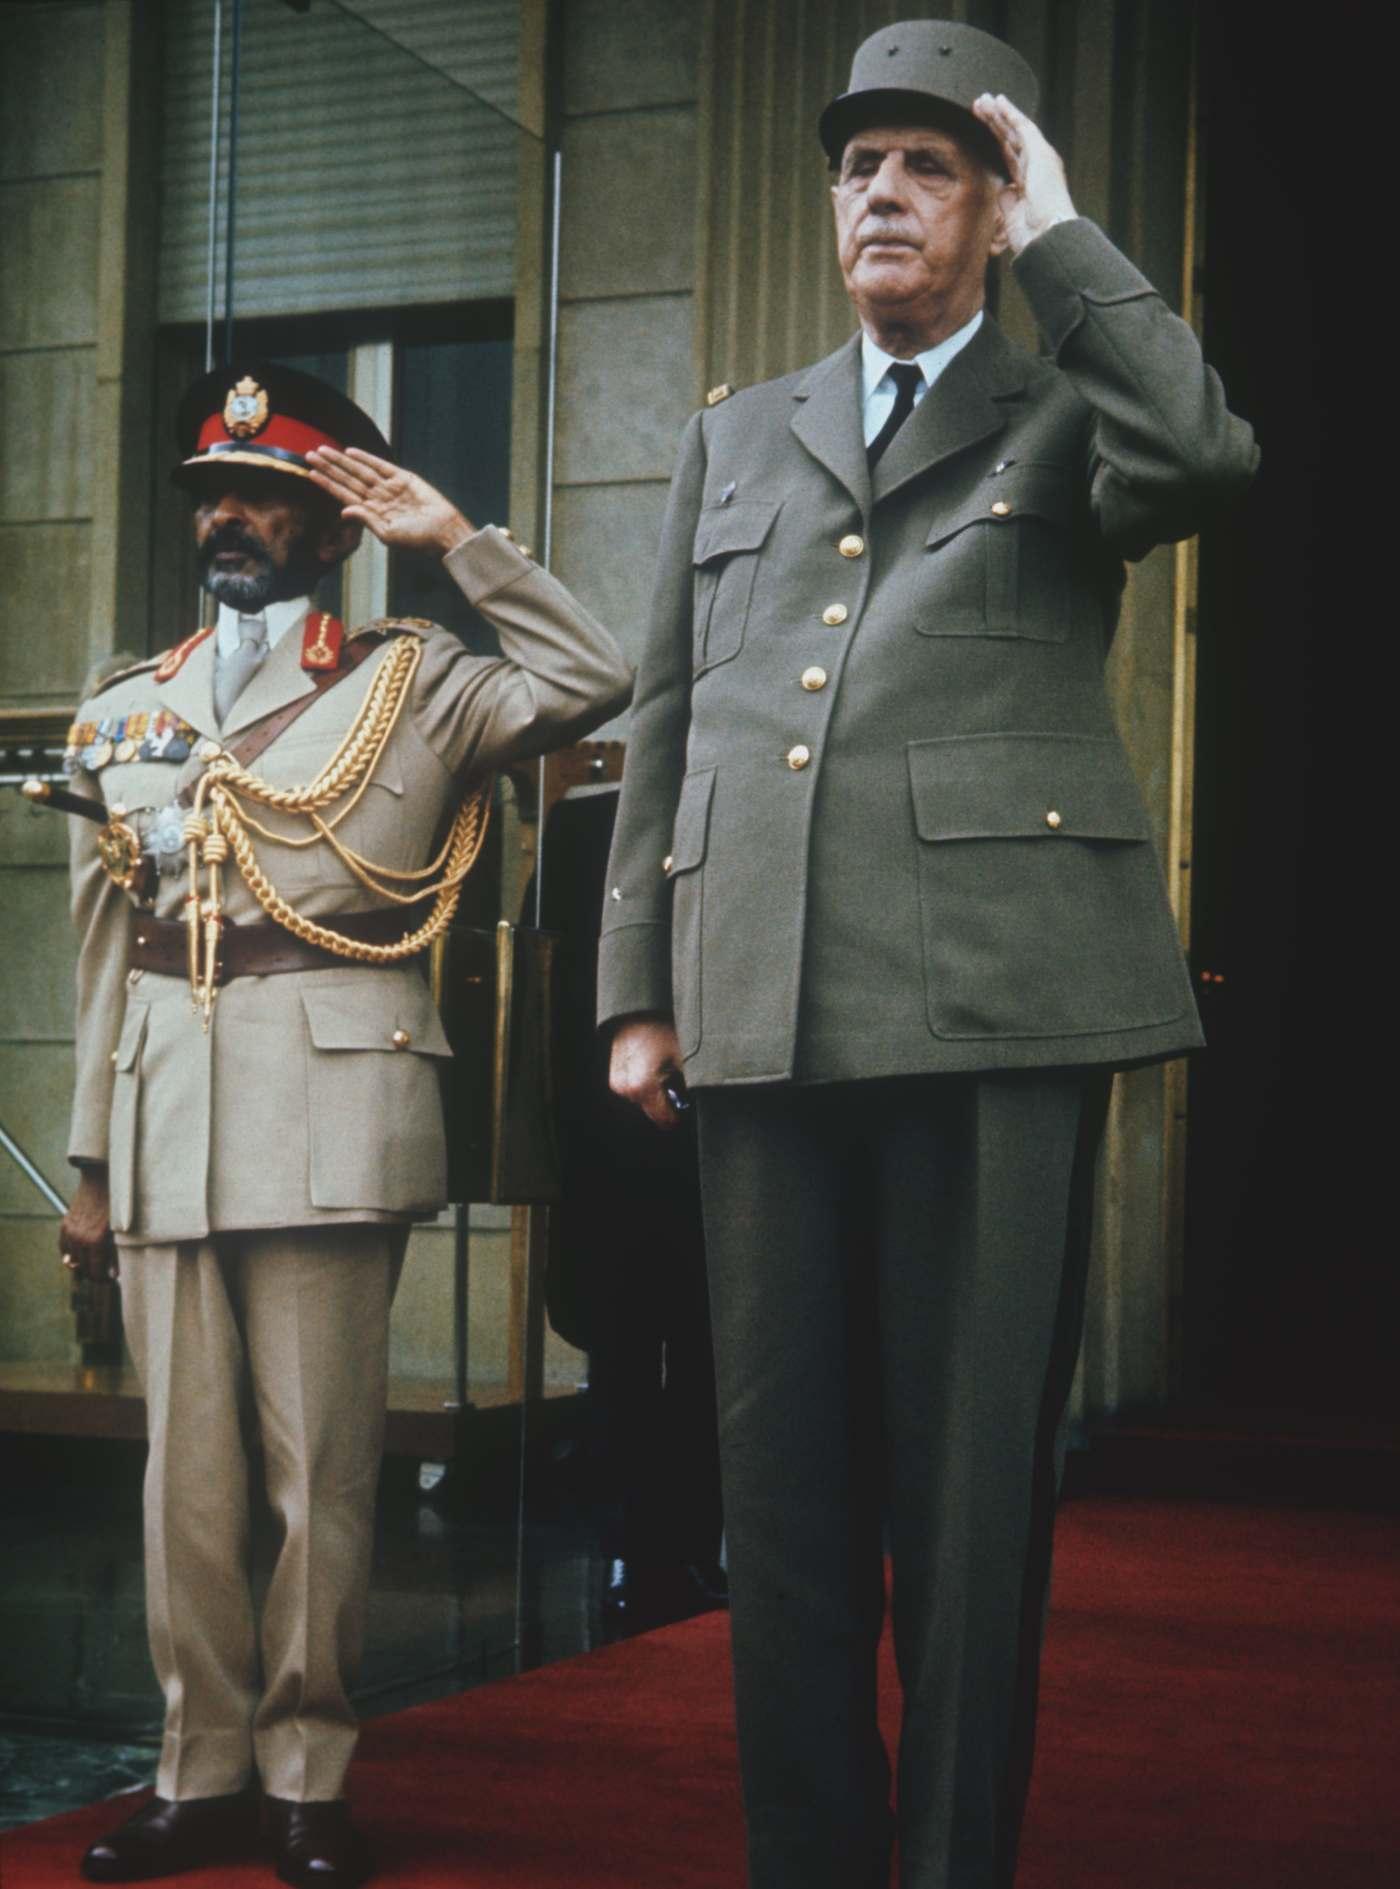 Ryszard Kapuściński Haile Selassie